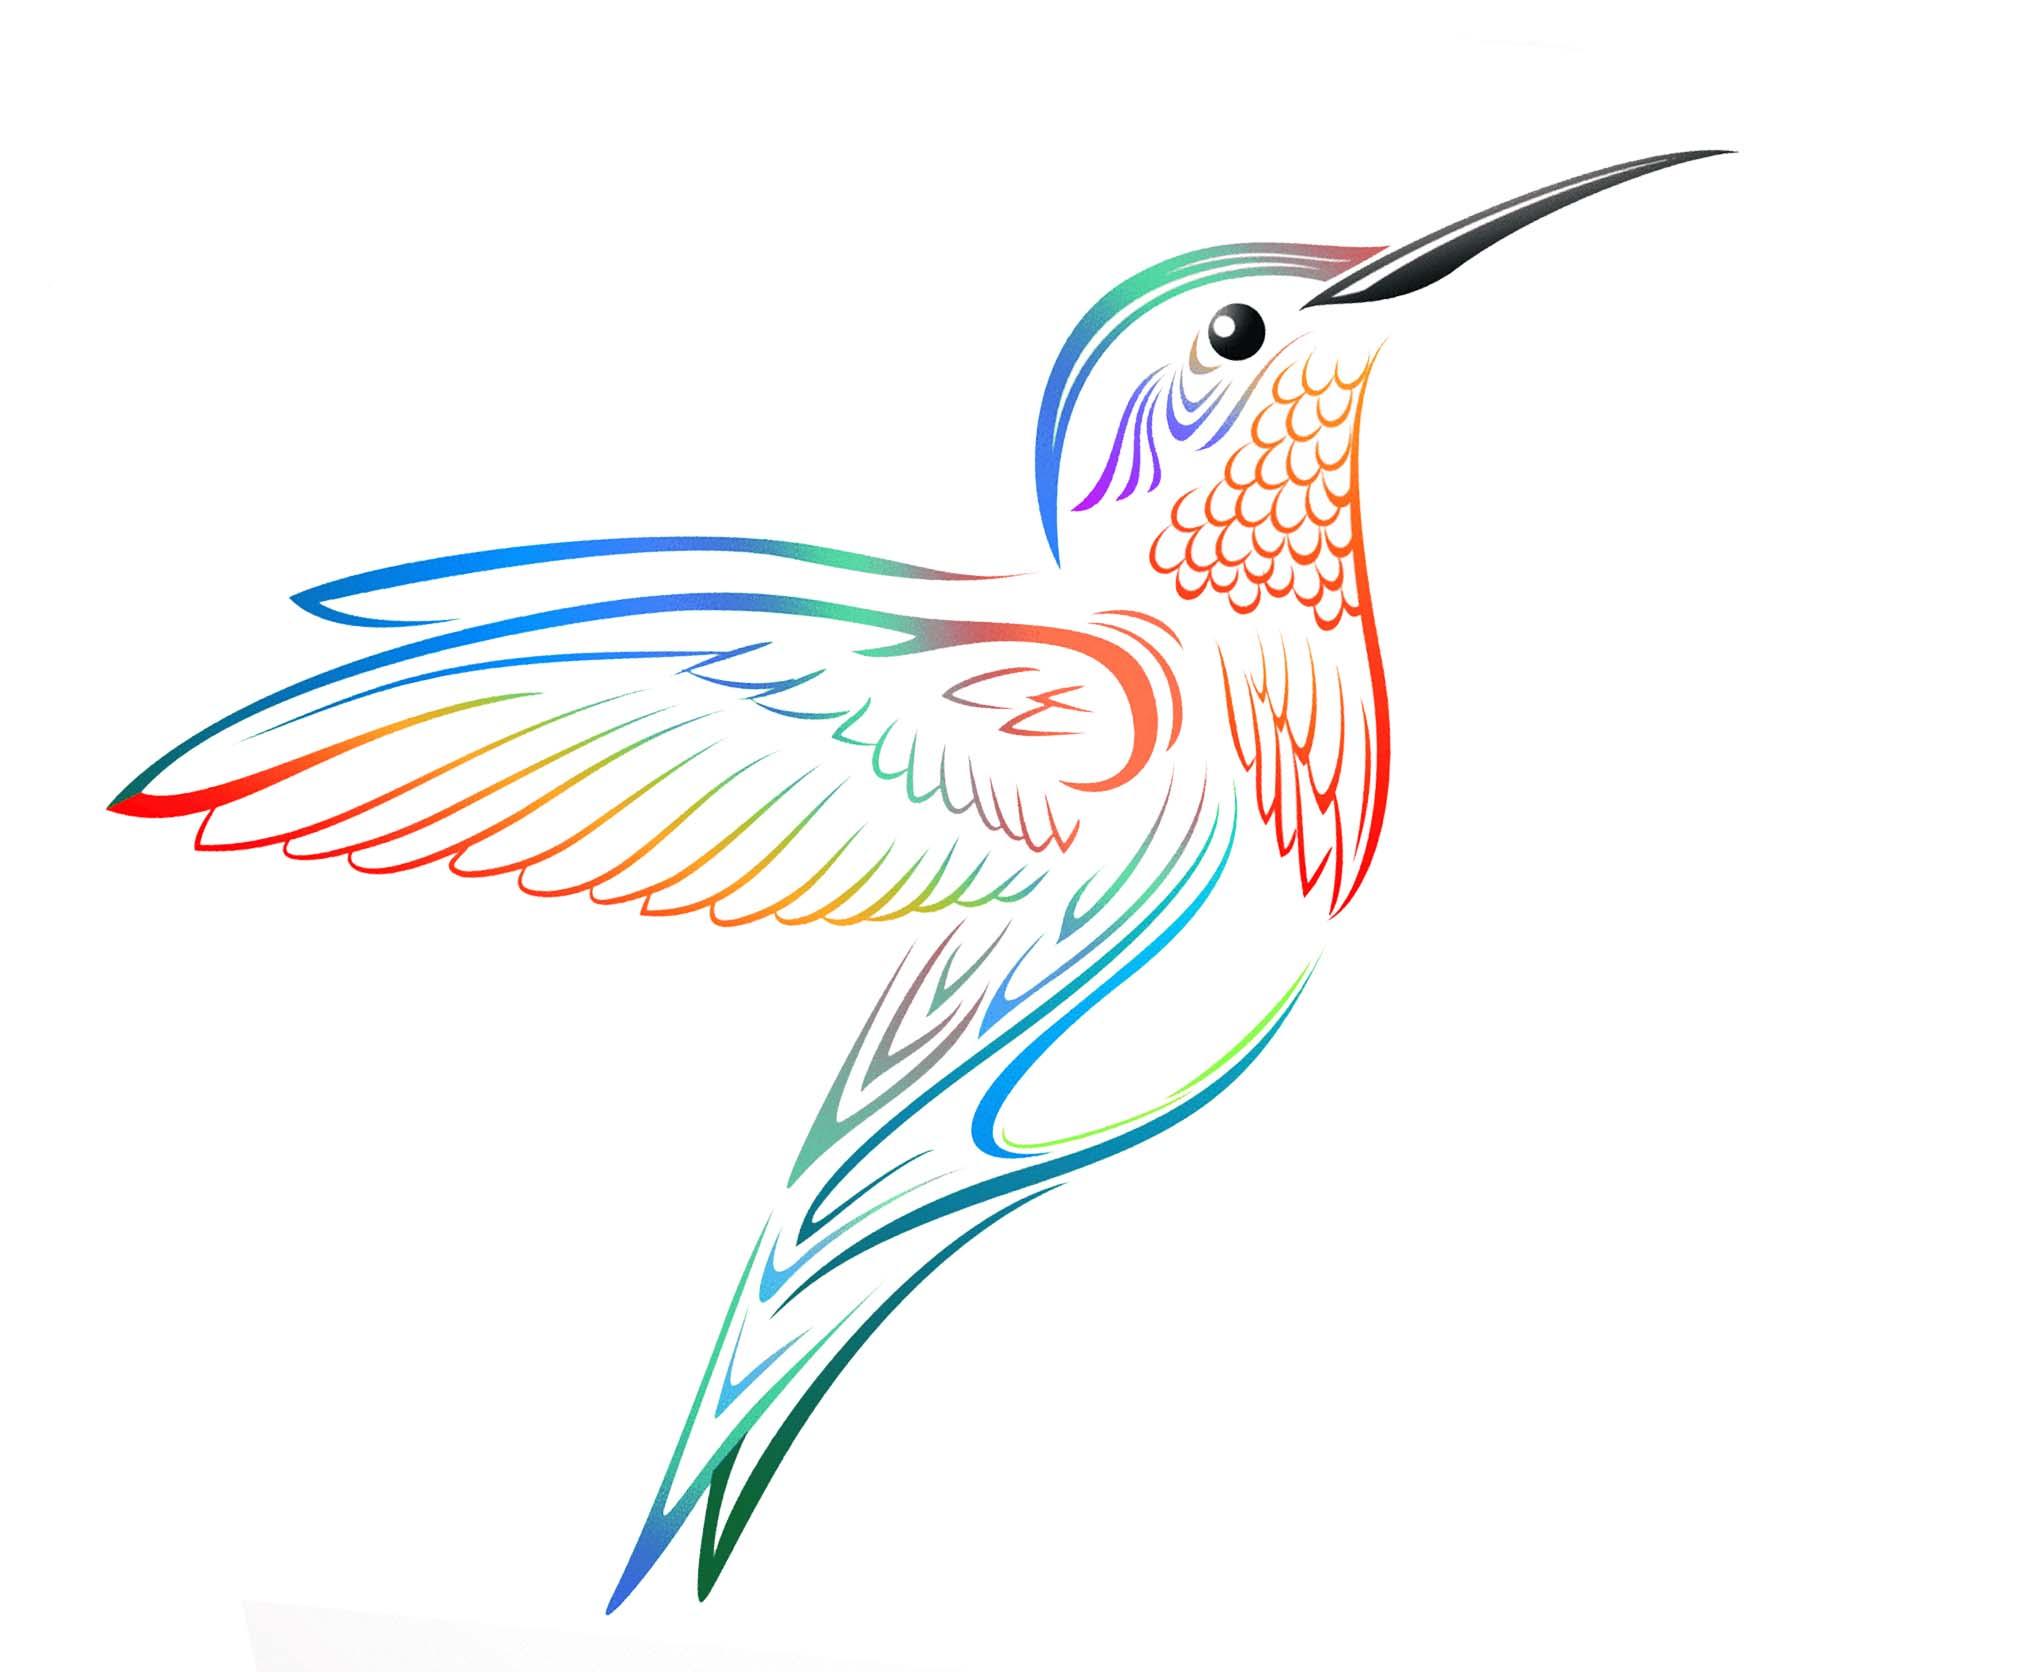 Clipart hummingbird clip free stock Hummingbird Clipart Images - Clipart1001 - Free Cliparts clip free stock